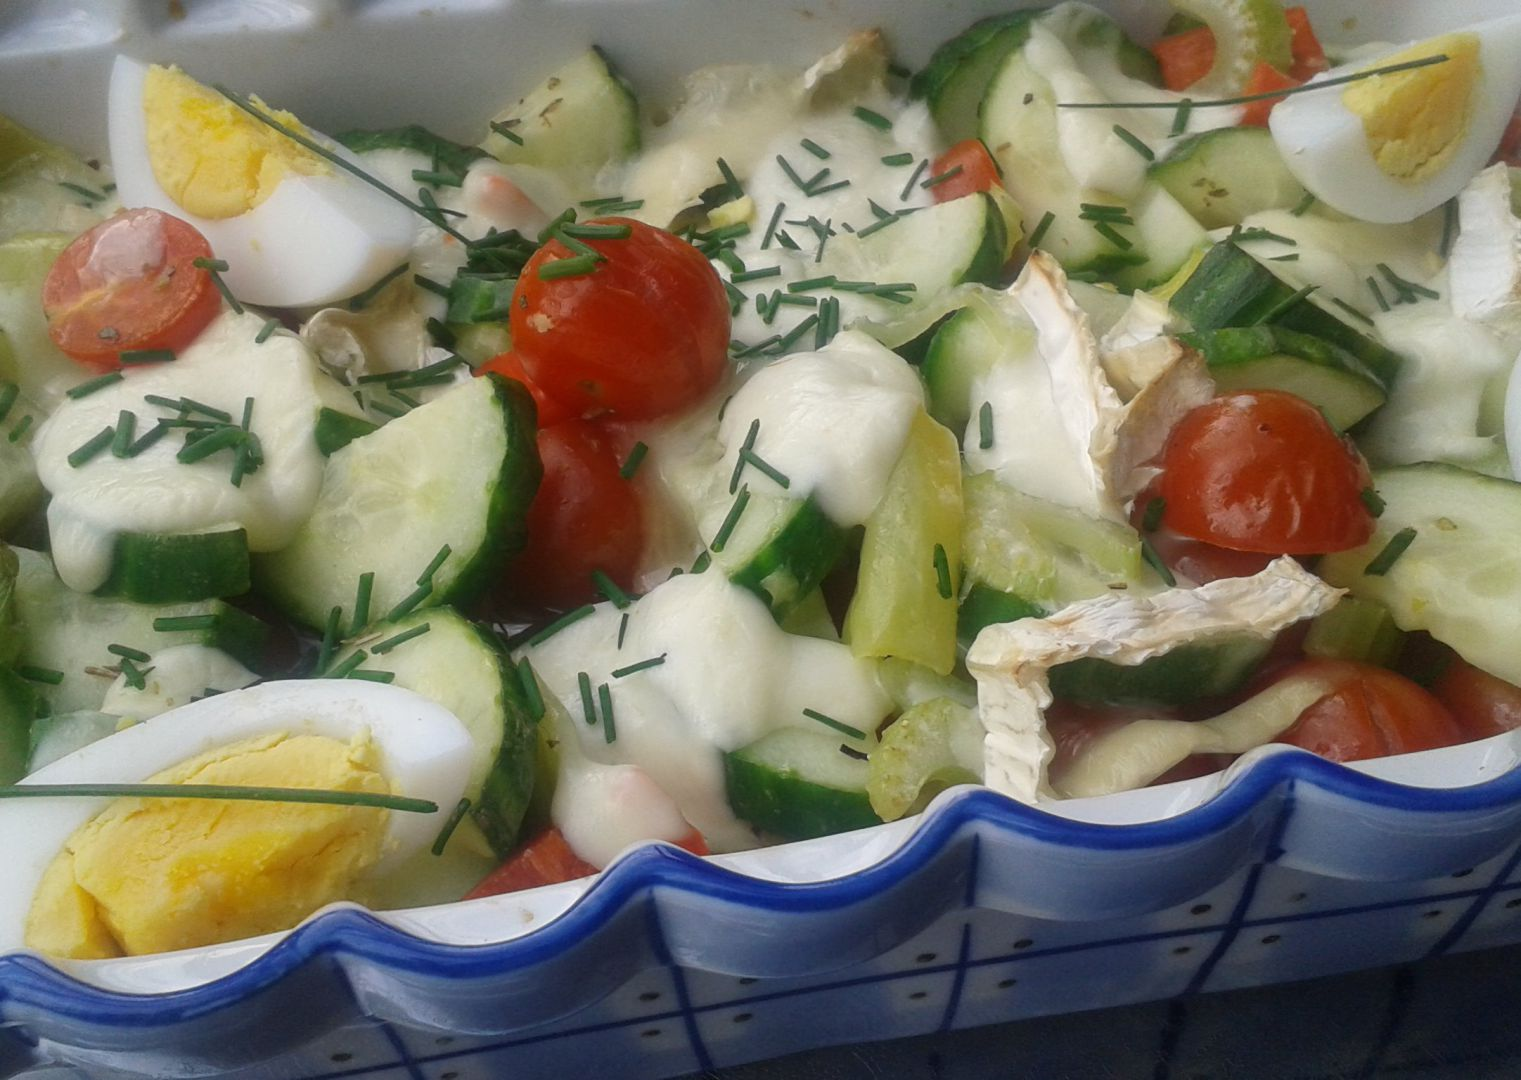 Teplý salát se sýrem recept